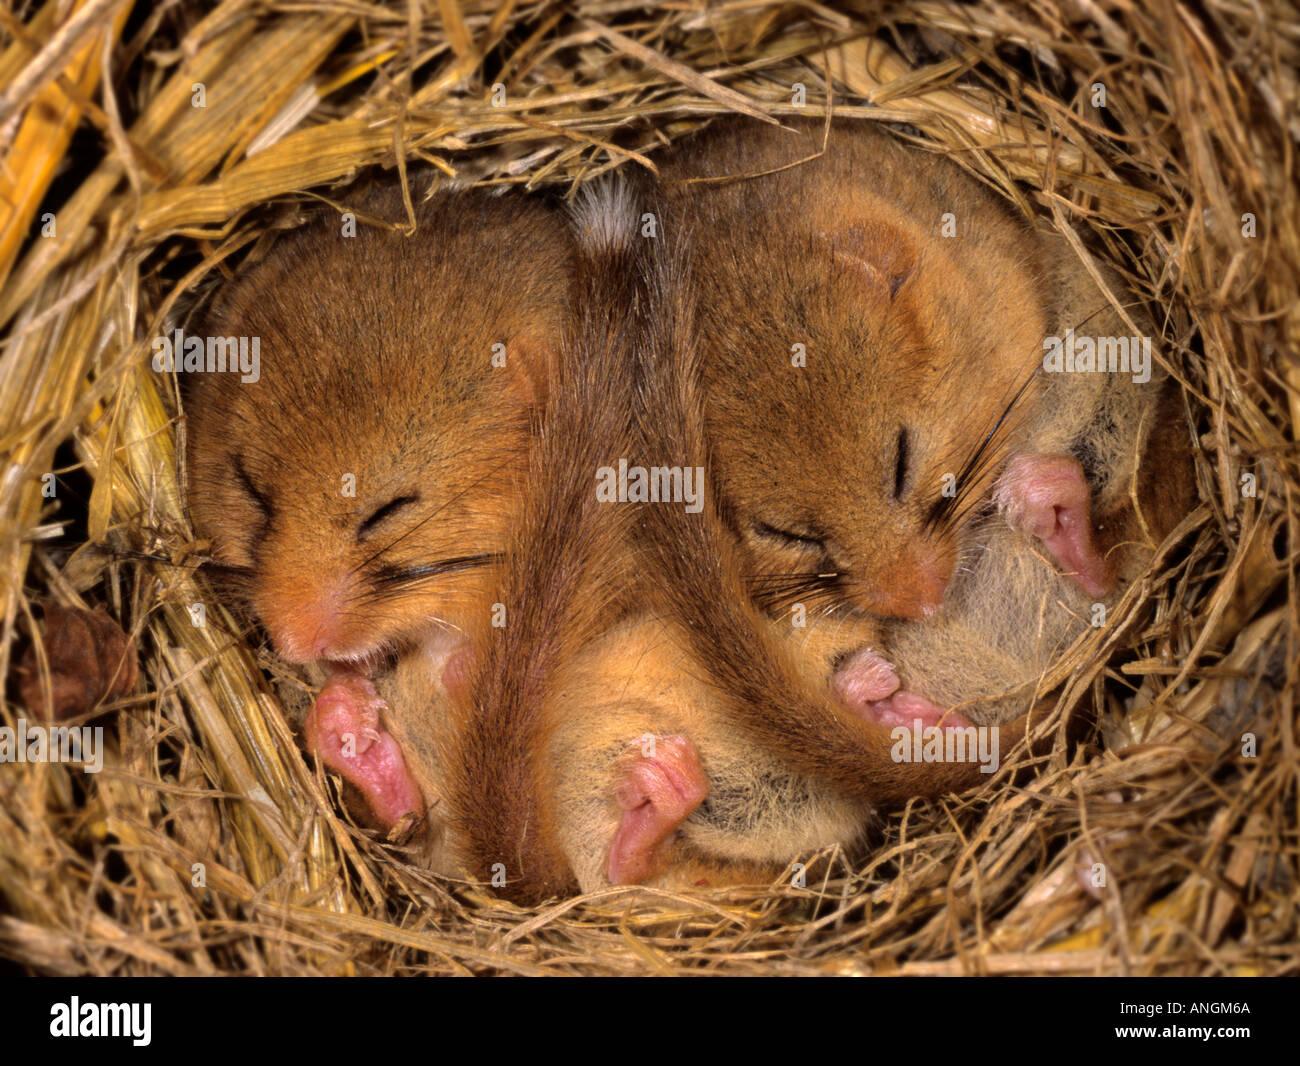 Hibernating hazel dormouse Muscardinus avellanarius, Captive, Wildwood Trust, UK - Stock Image